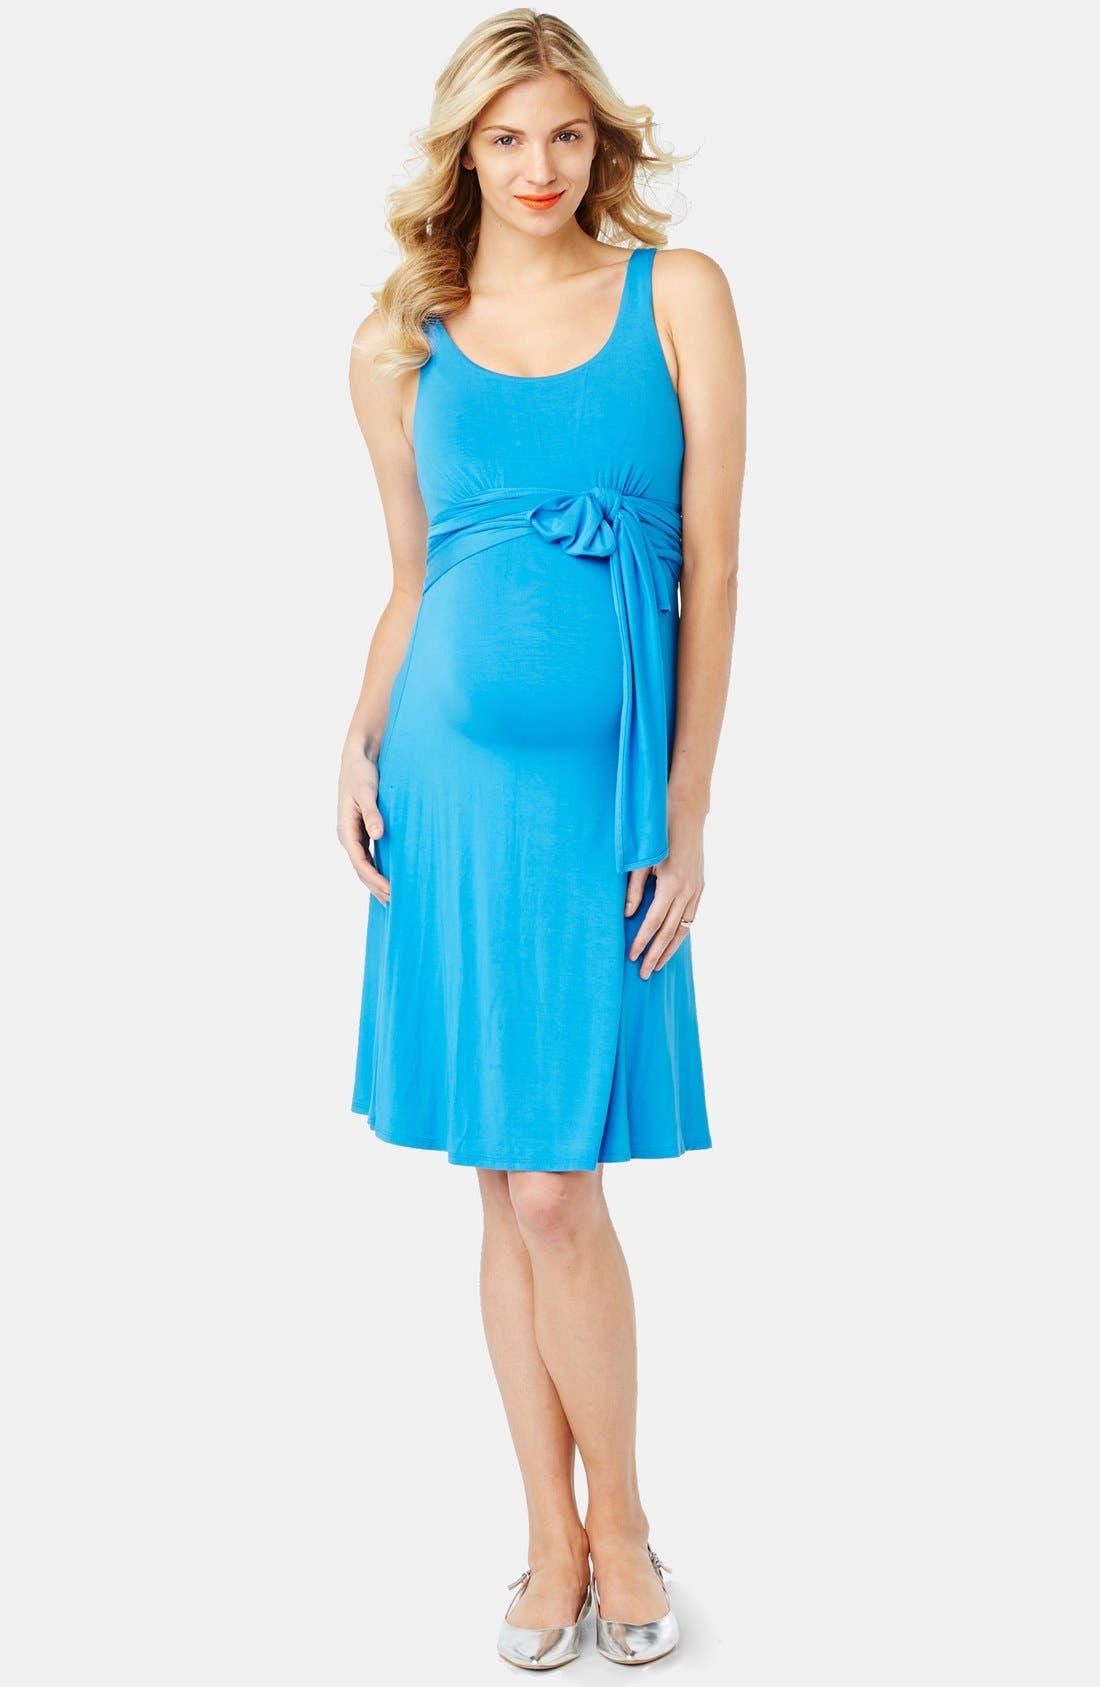 'Best' Maternity Dress,                             Main thumbnail 1, color,                             430